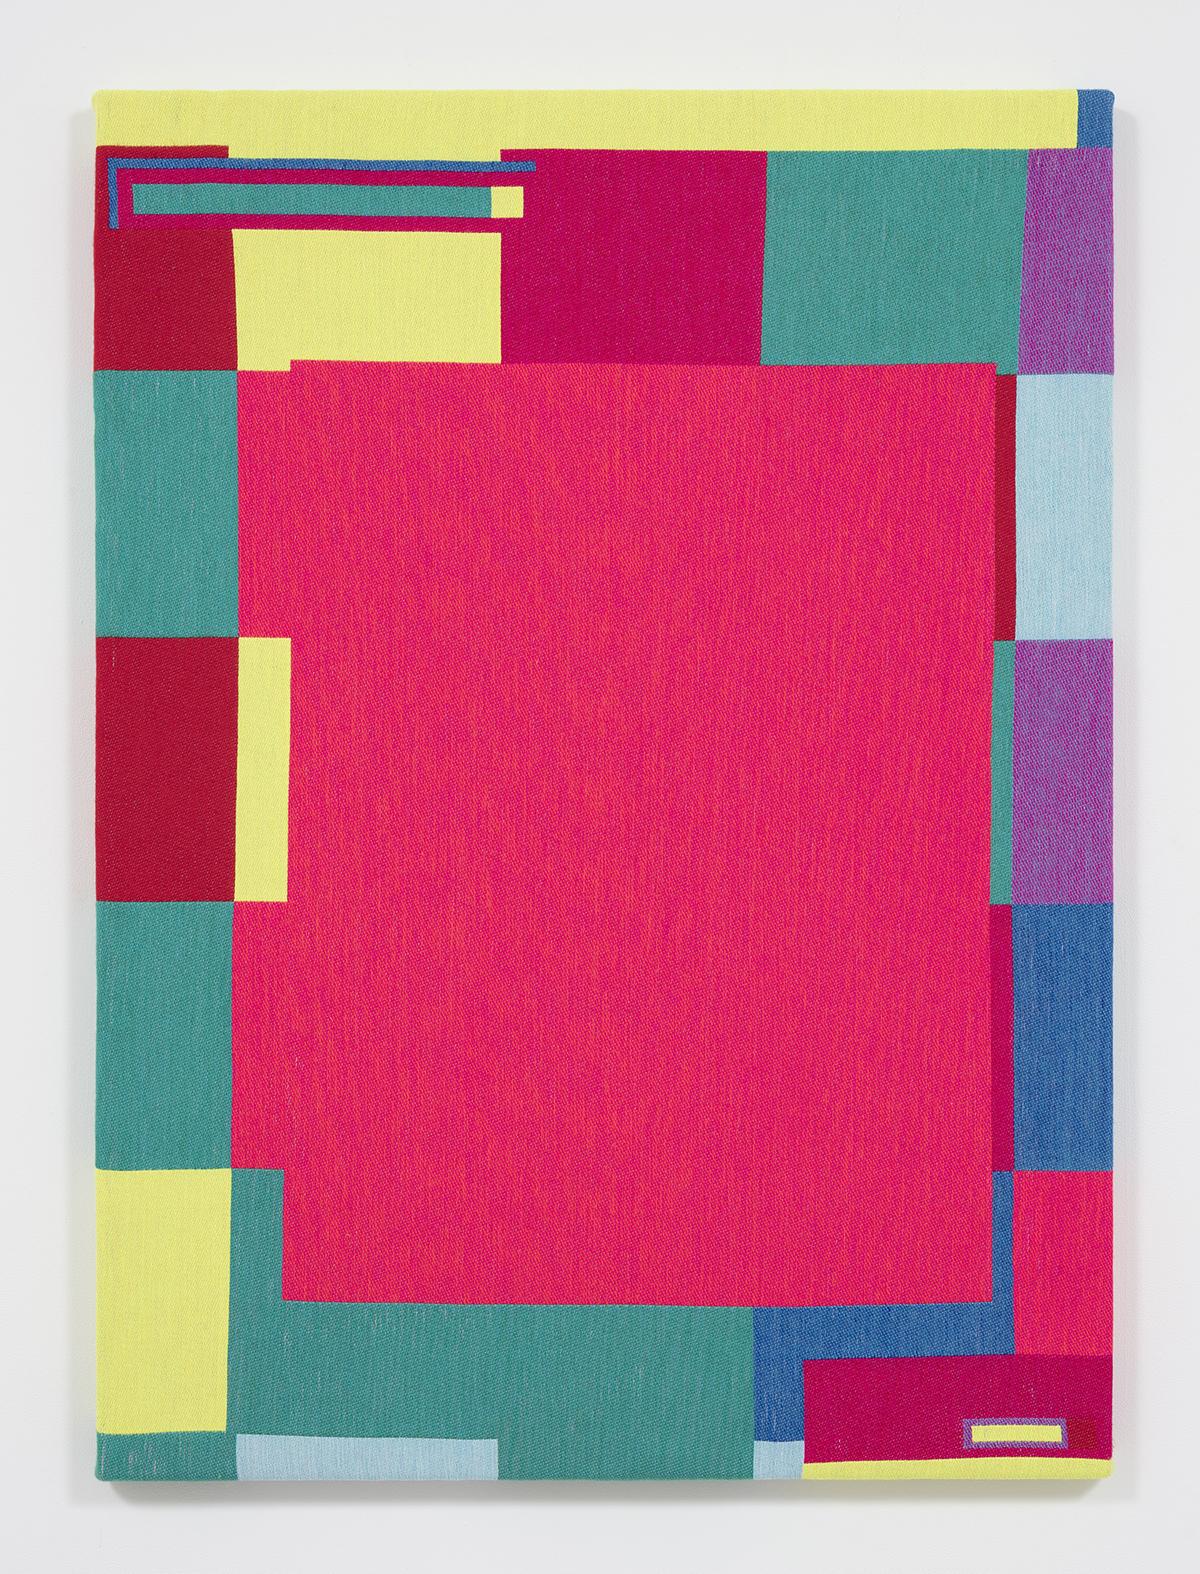 Rafael Rozendaal. <em>Abstract Browsing 17 05 01 (Waze)</em>, 2017. Jacquard weaving, 56 3/4 x 41 1/2 inches  (144.1 x 105.4 cm)